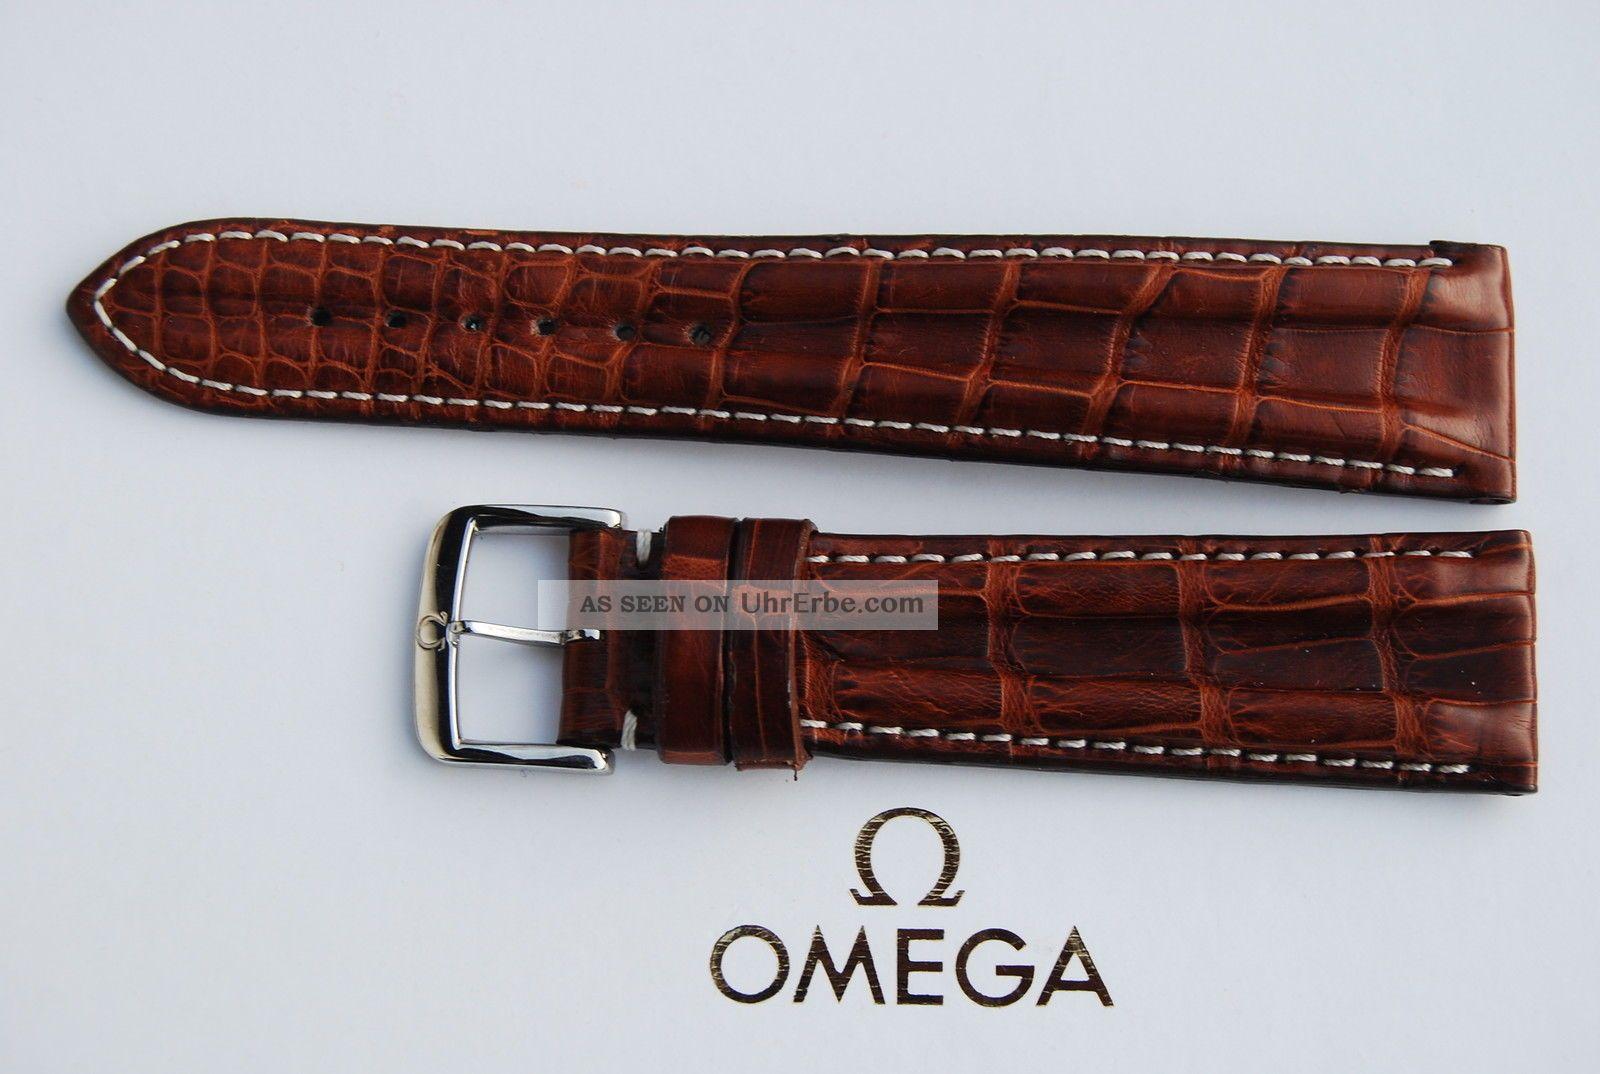 Omega Kroko - Lederband/braun Krokodil 20mm Armband/bracelet Leder 1 Armbanduhren Bild